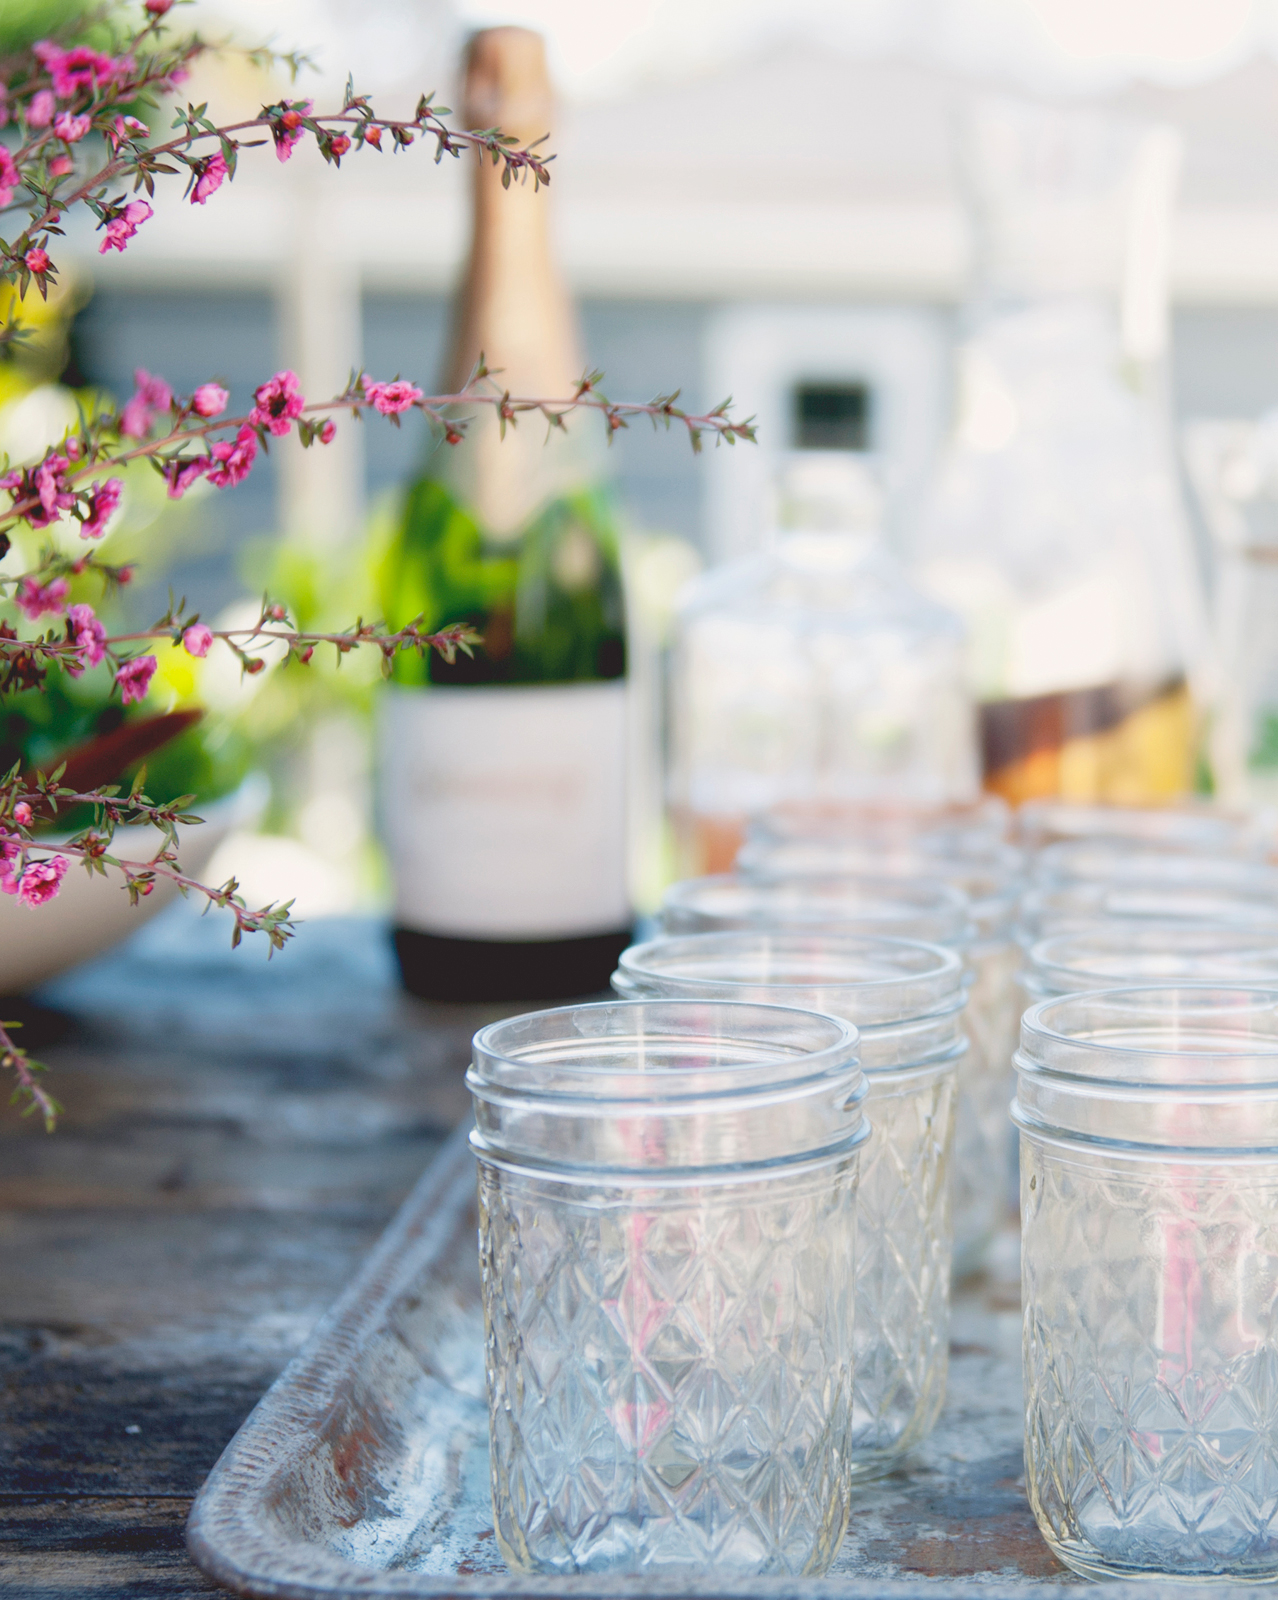 claire-thomas-bridal-shower-garden-jar-glasses-0814.jpg